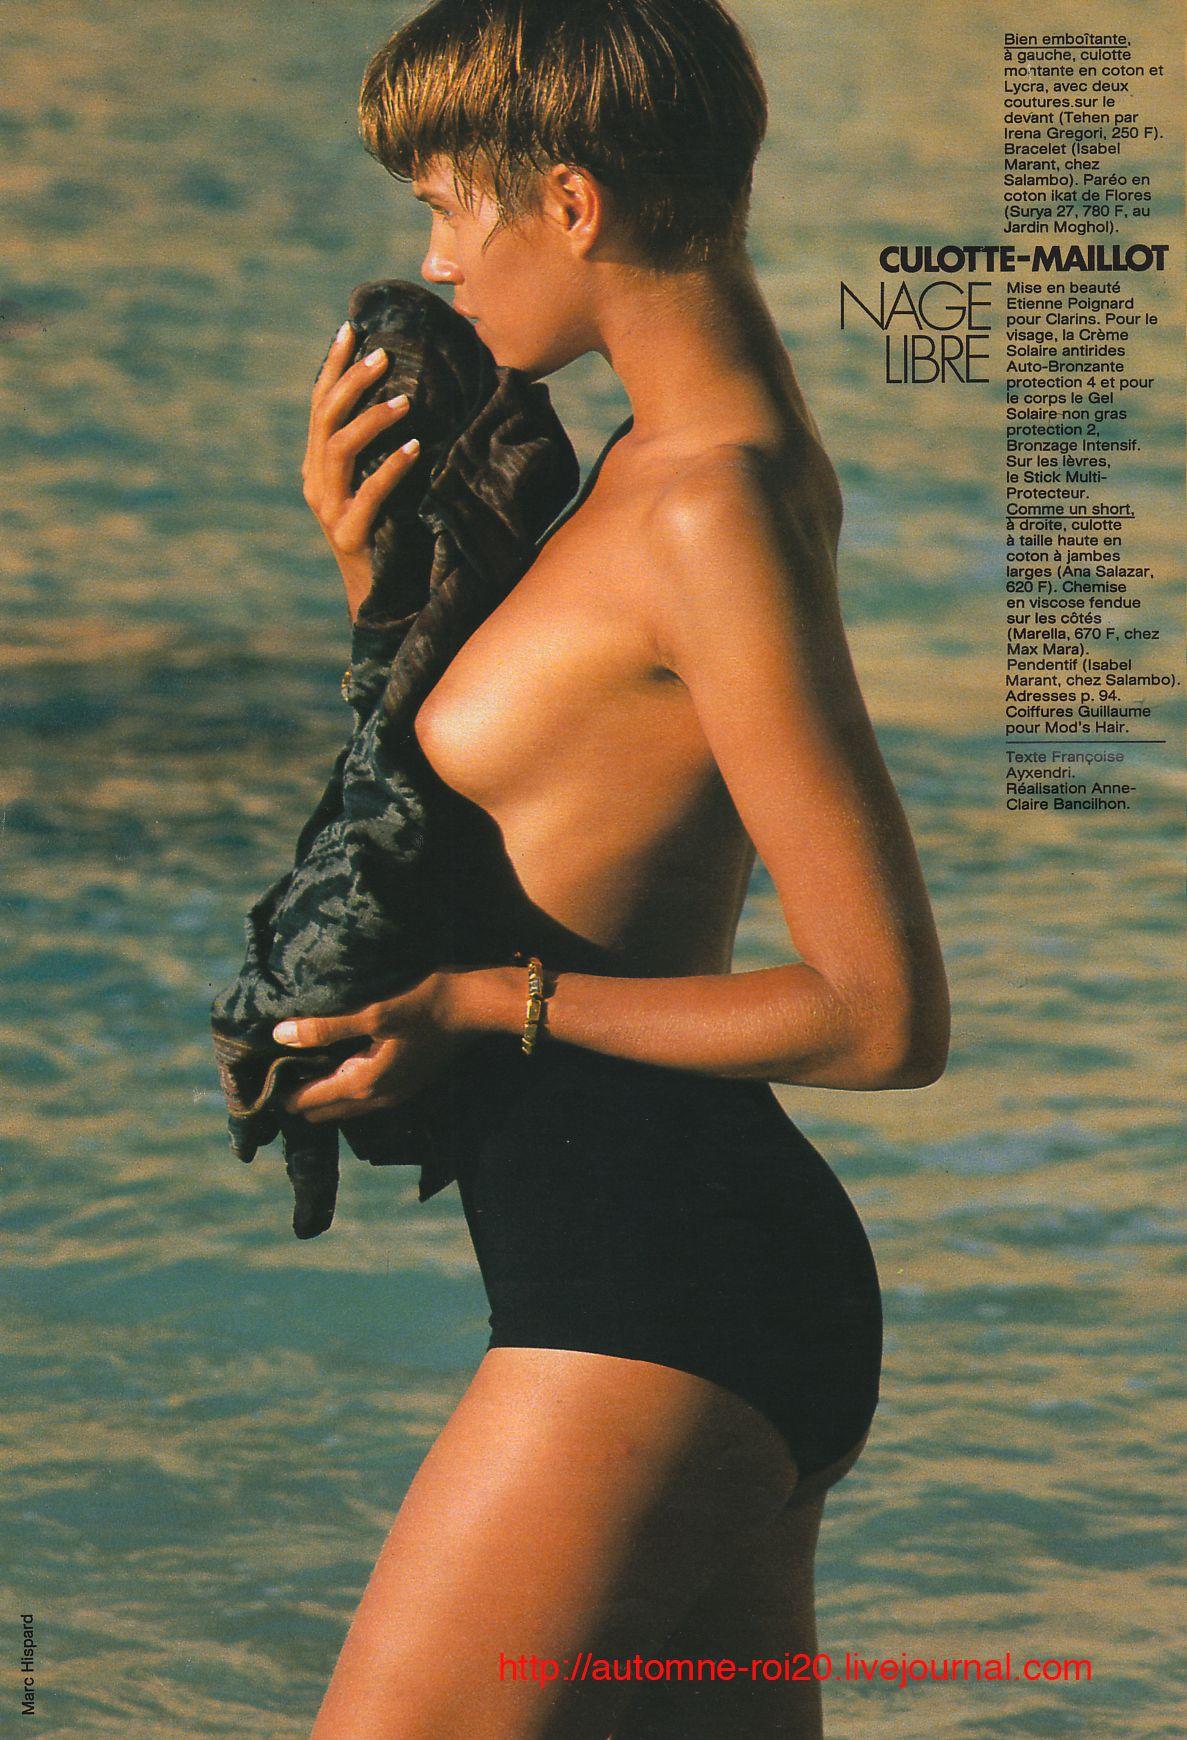 Bikini Emma Sjoberg nude (24 foto and video), Topless, Cleavage, Feet, see through 2006